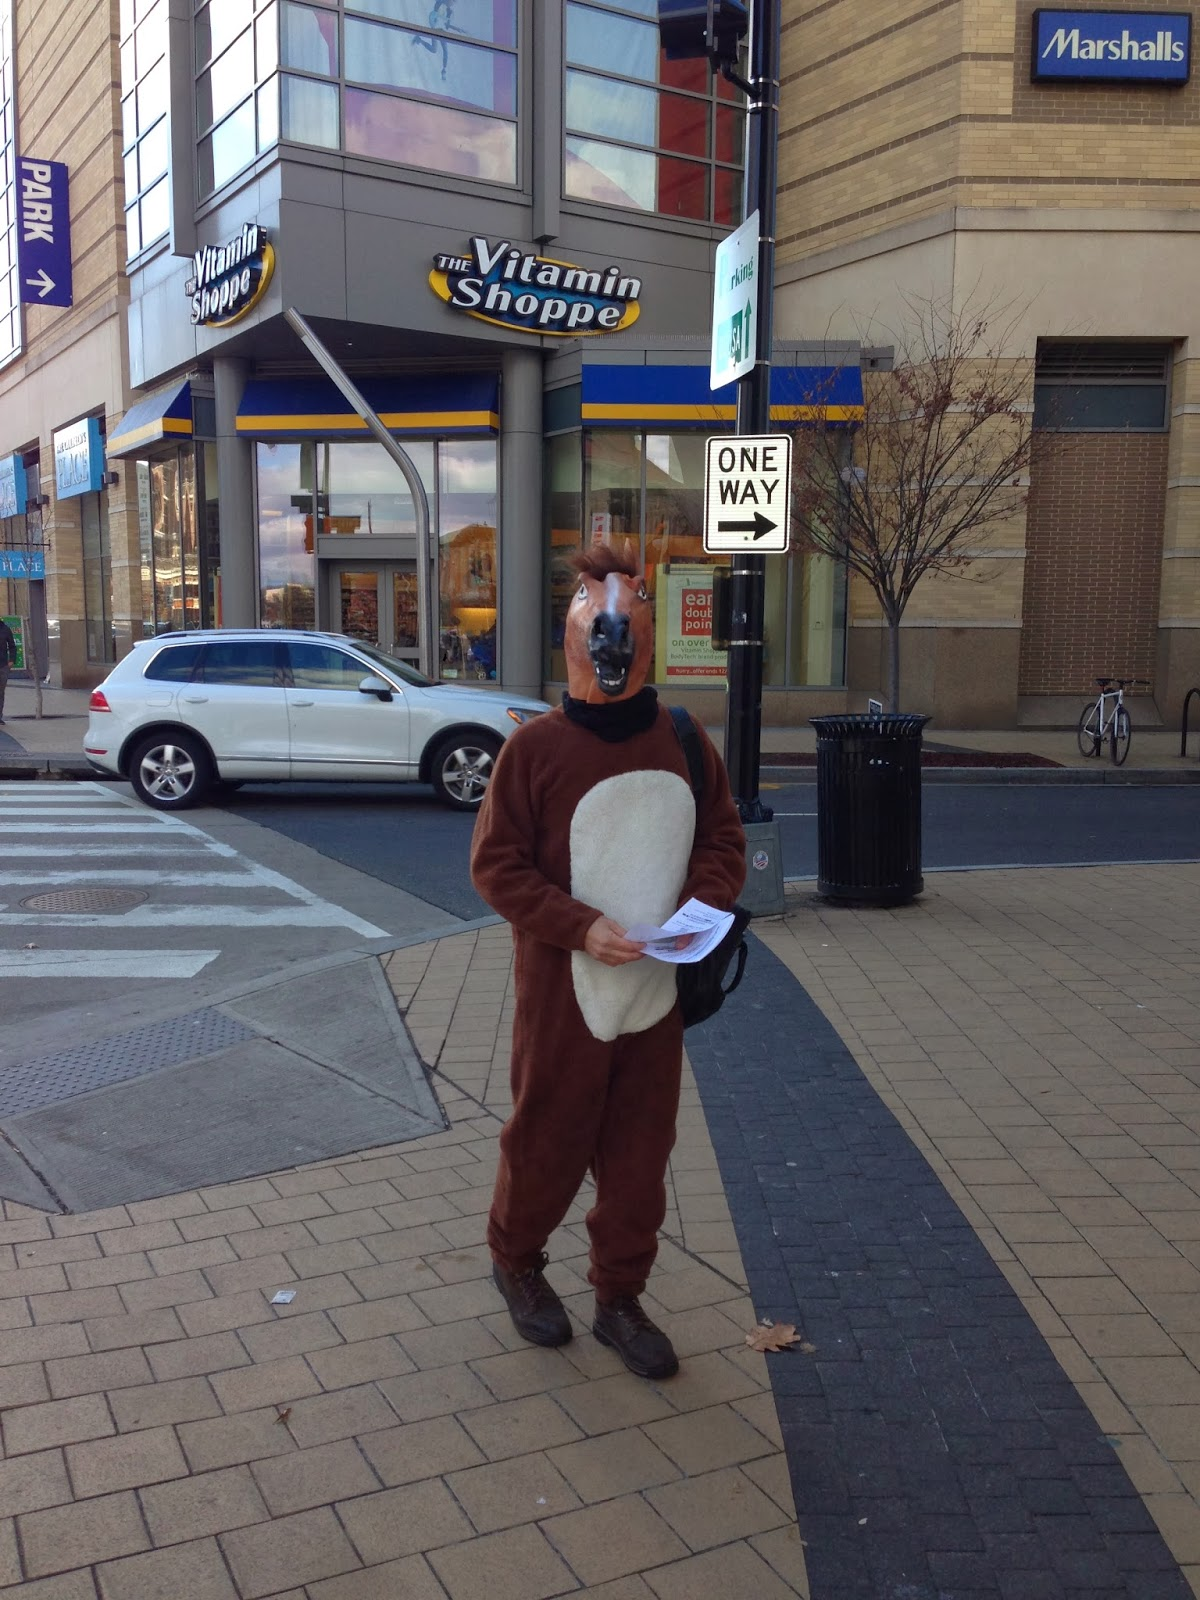 Funny Horse Mask Gif Of those funny horse masks